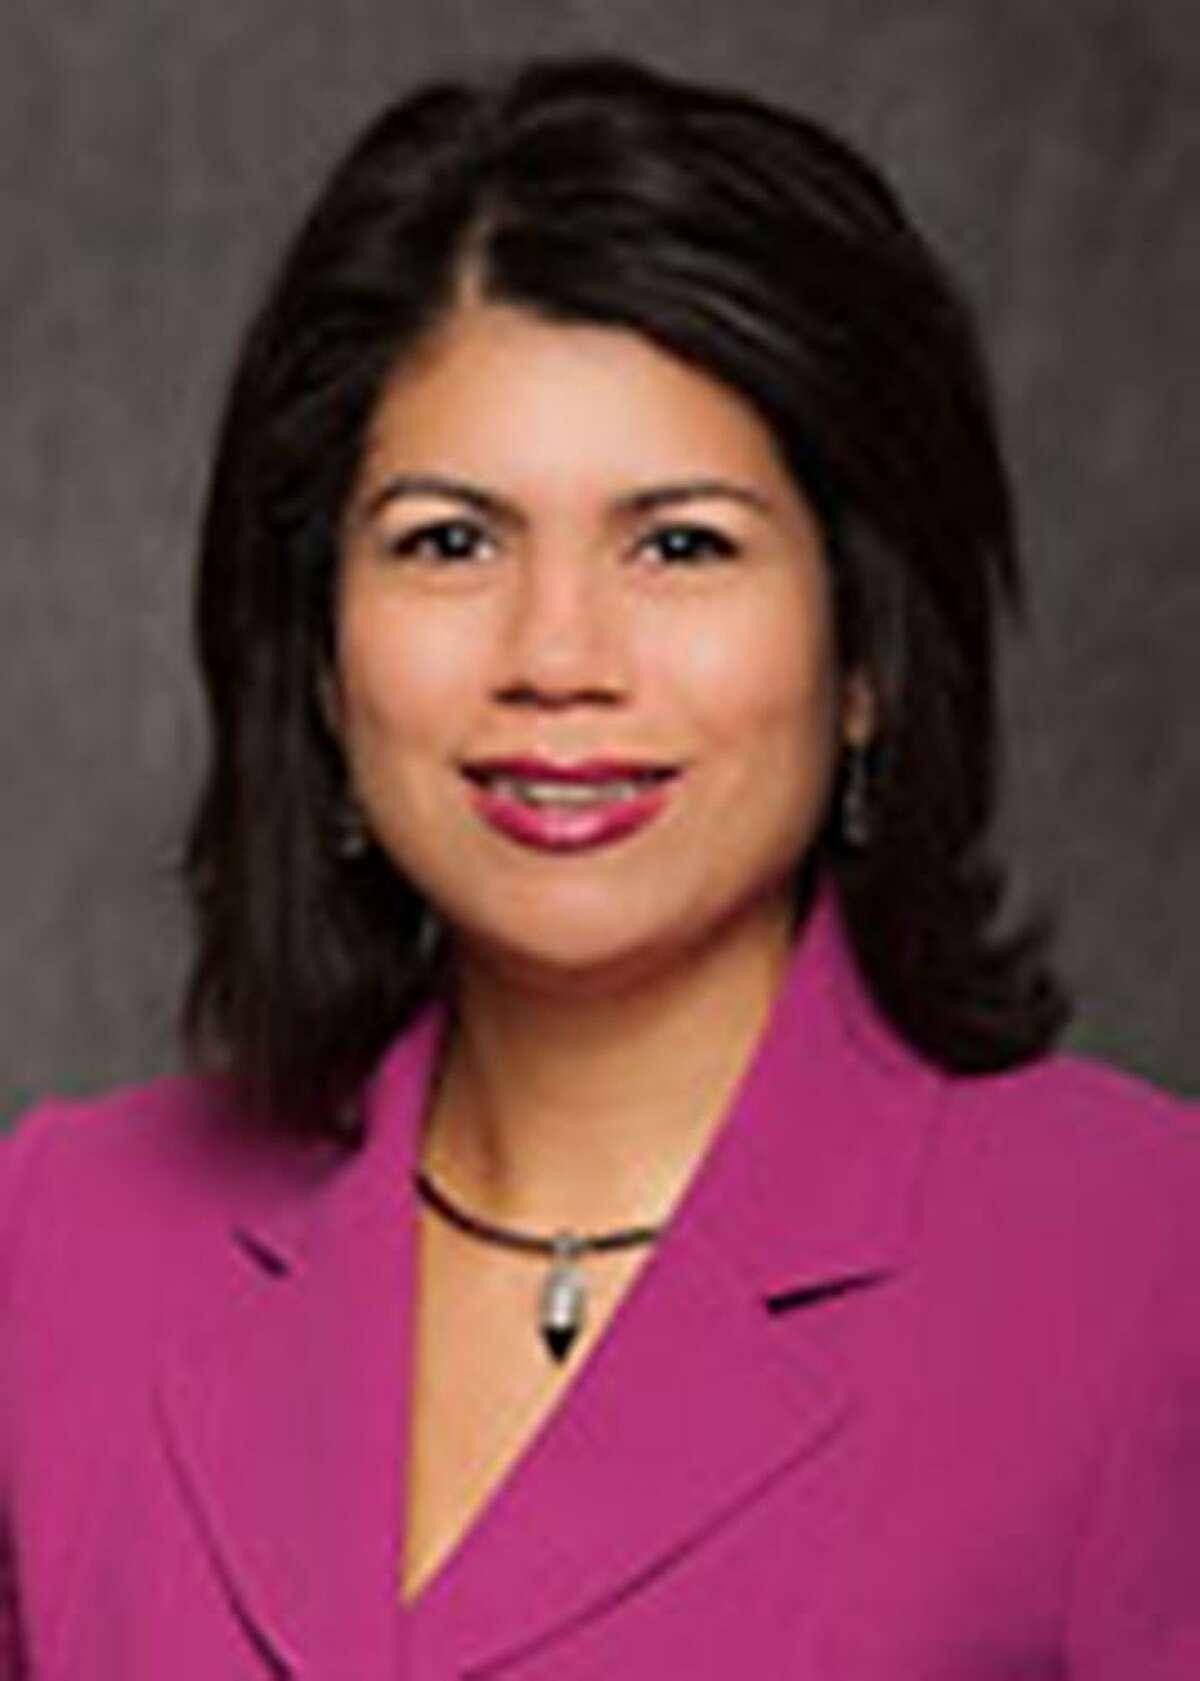 Carol Alvarado is the representative for Texas' 145th state house district.